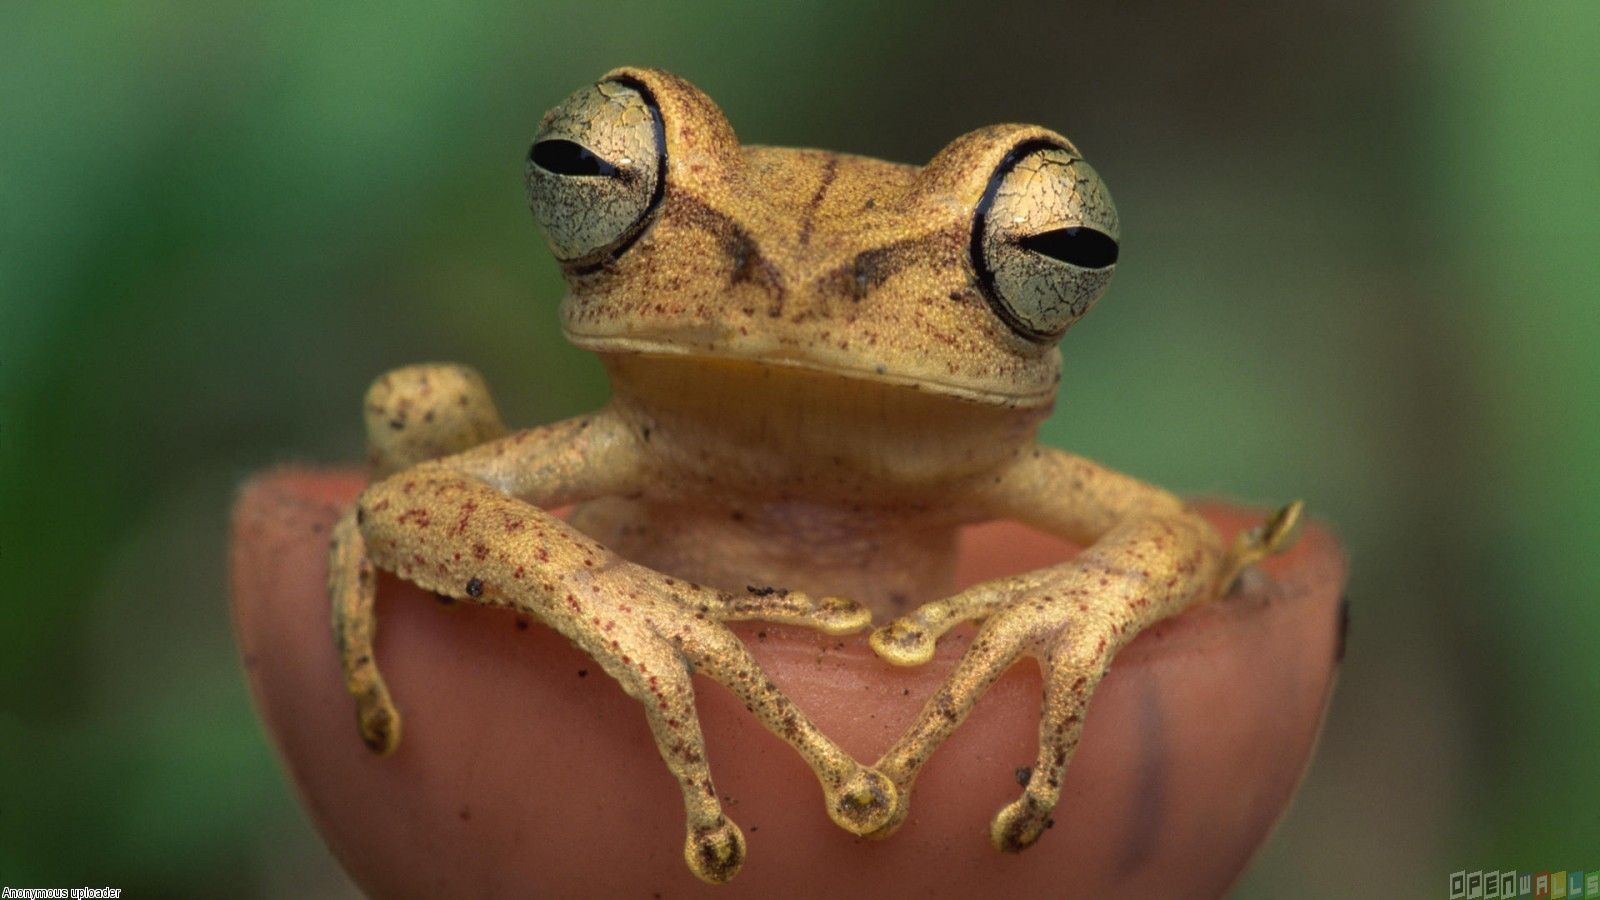 Cute frog wallpaper 17814   Open Walls 1600x900